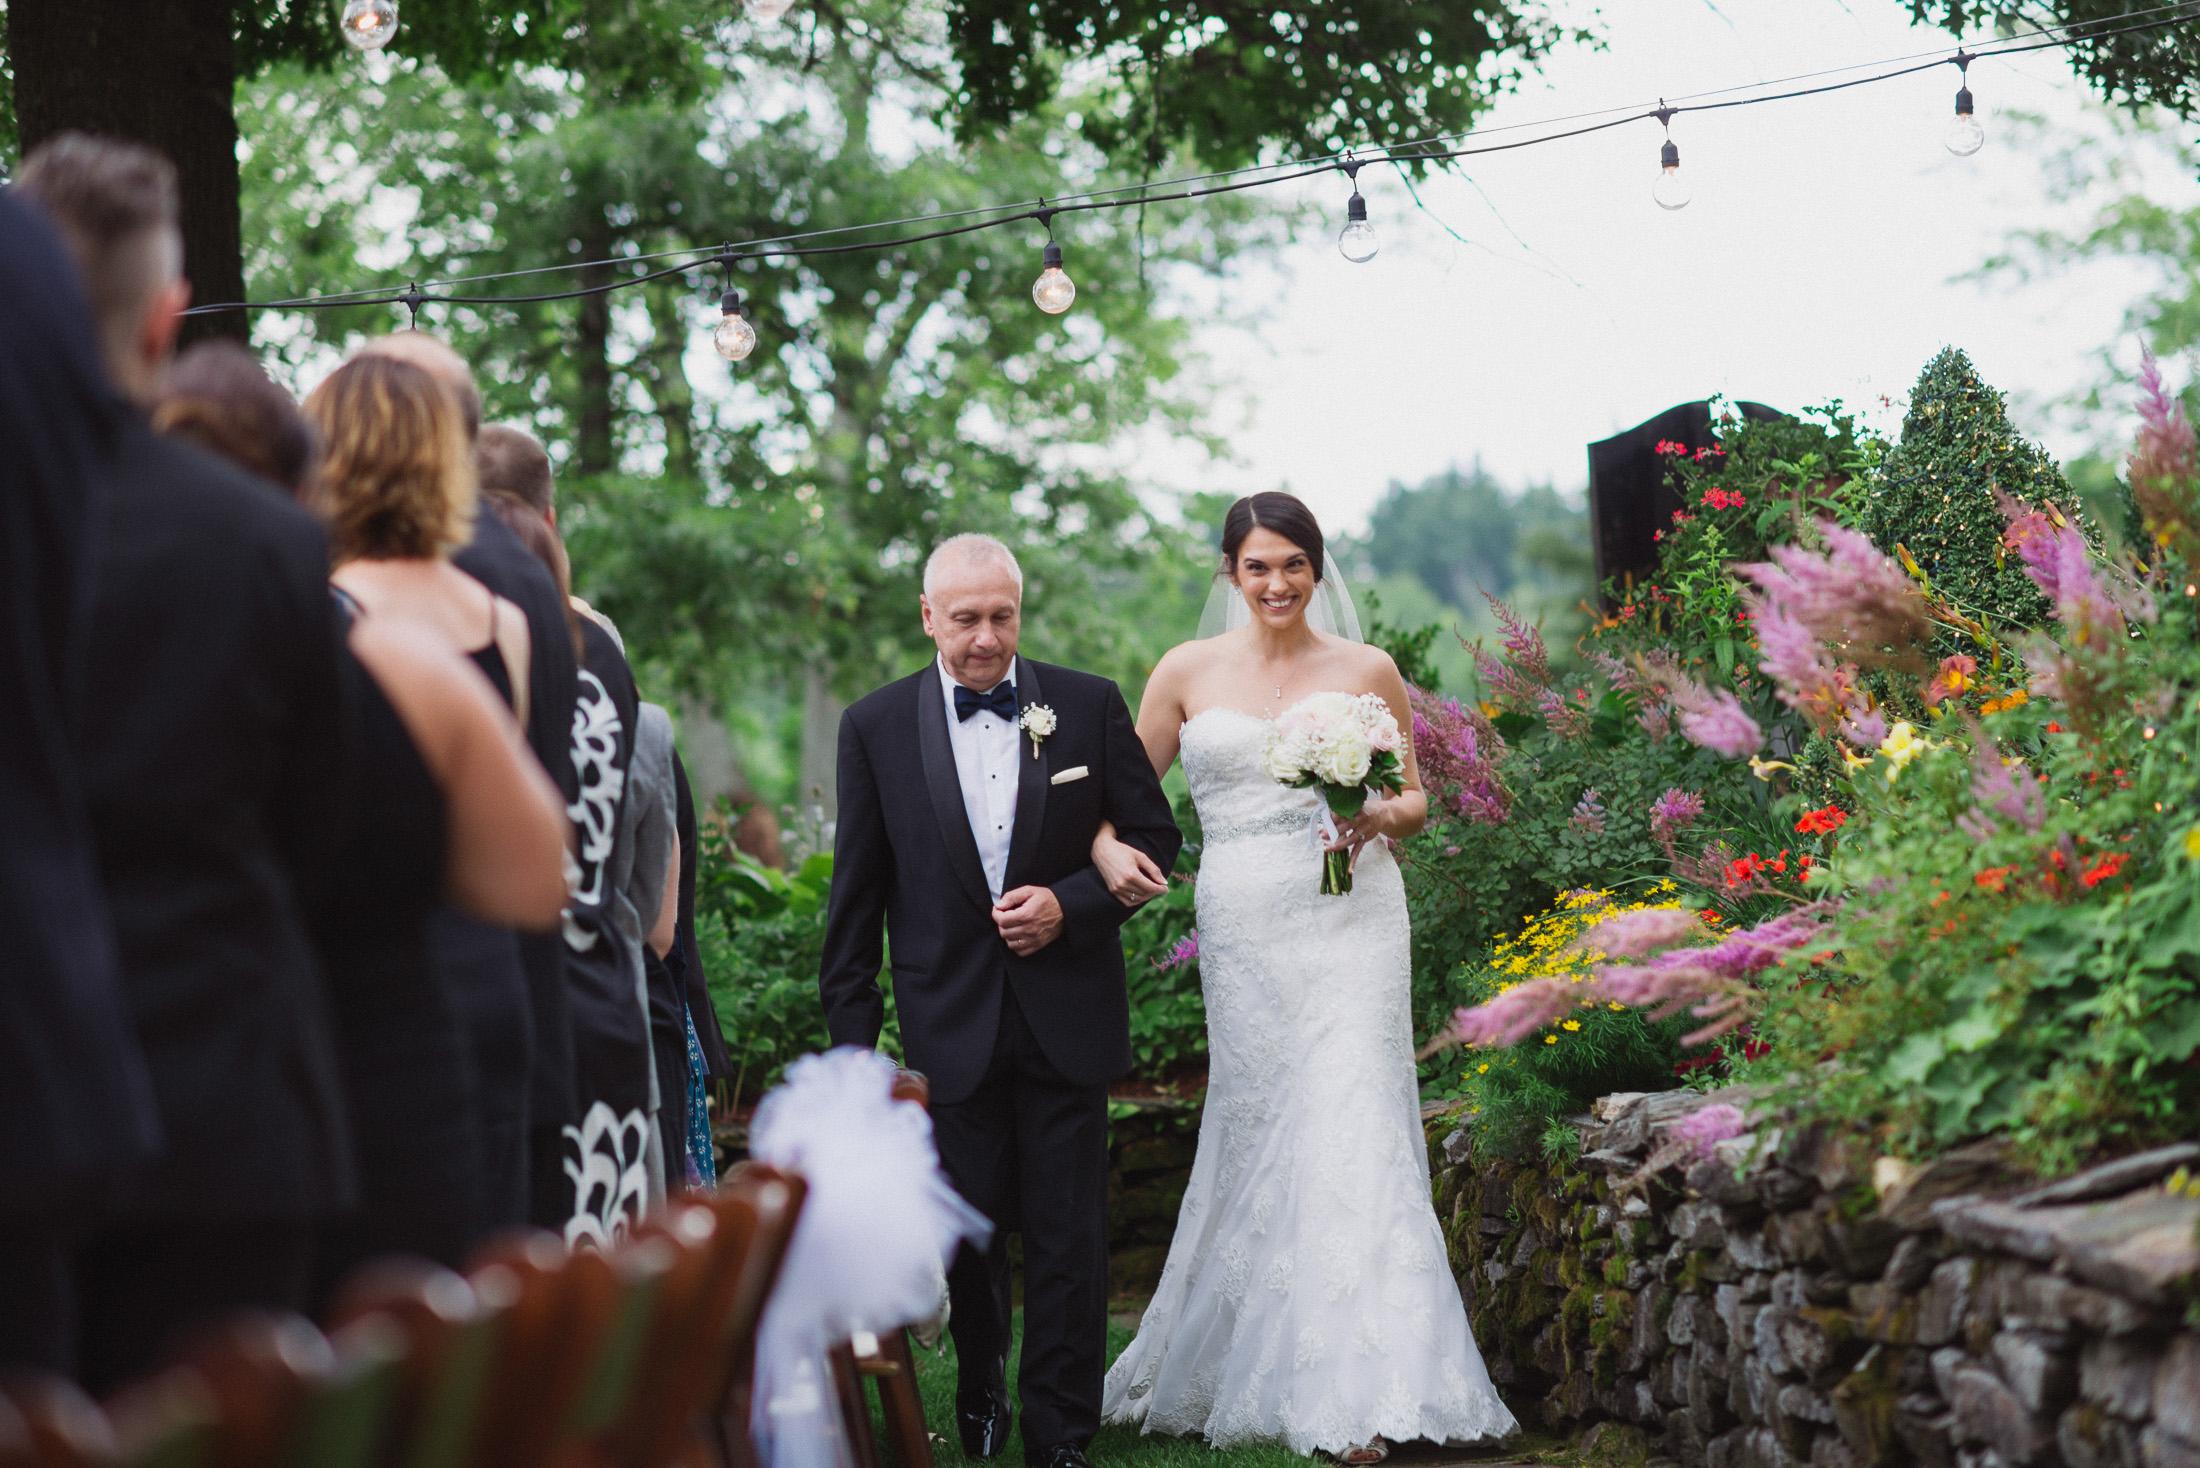 NH Wedding Photographer: bride walking with dad